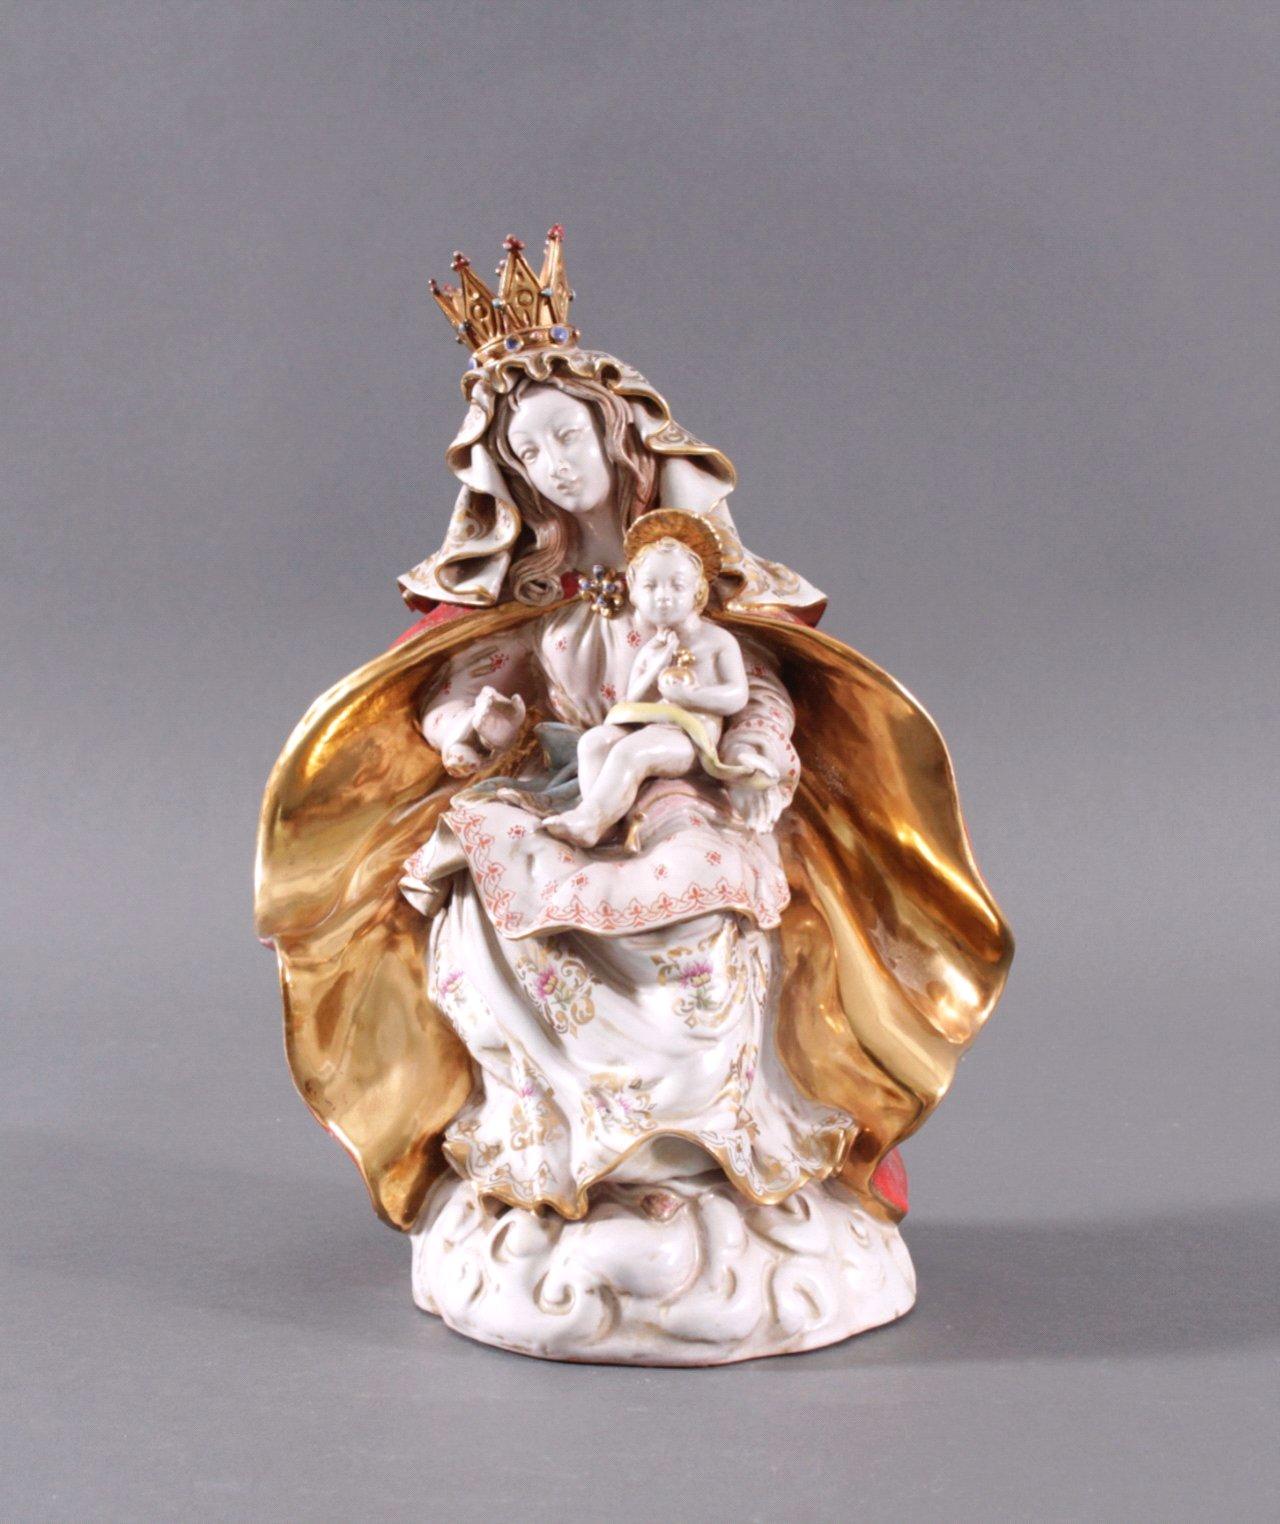 Italienische Keramikfigur, Maria mit Kind